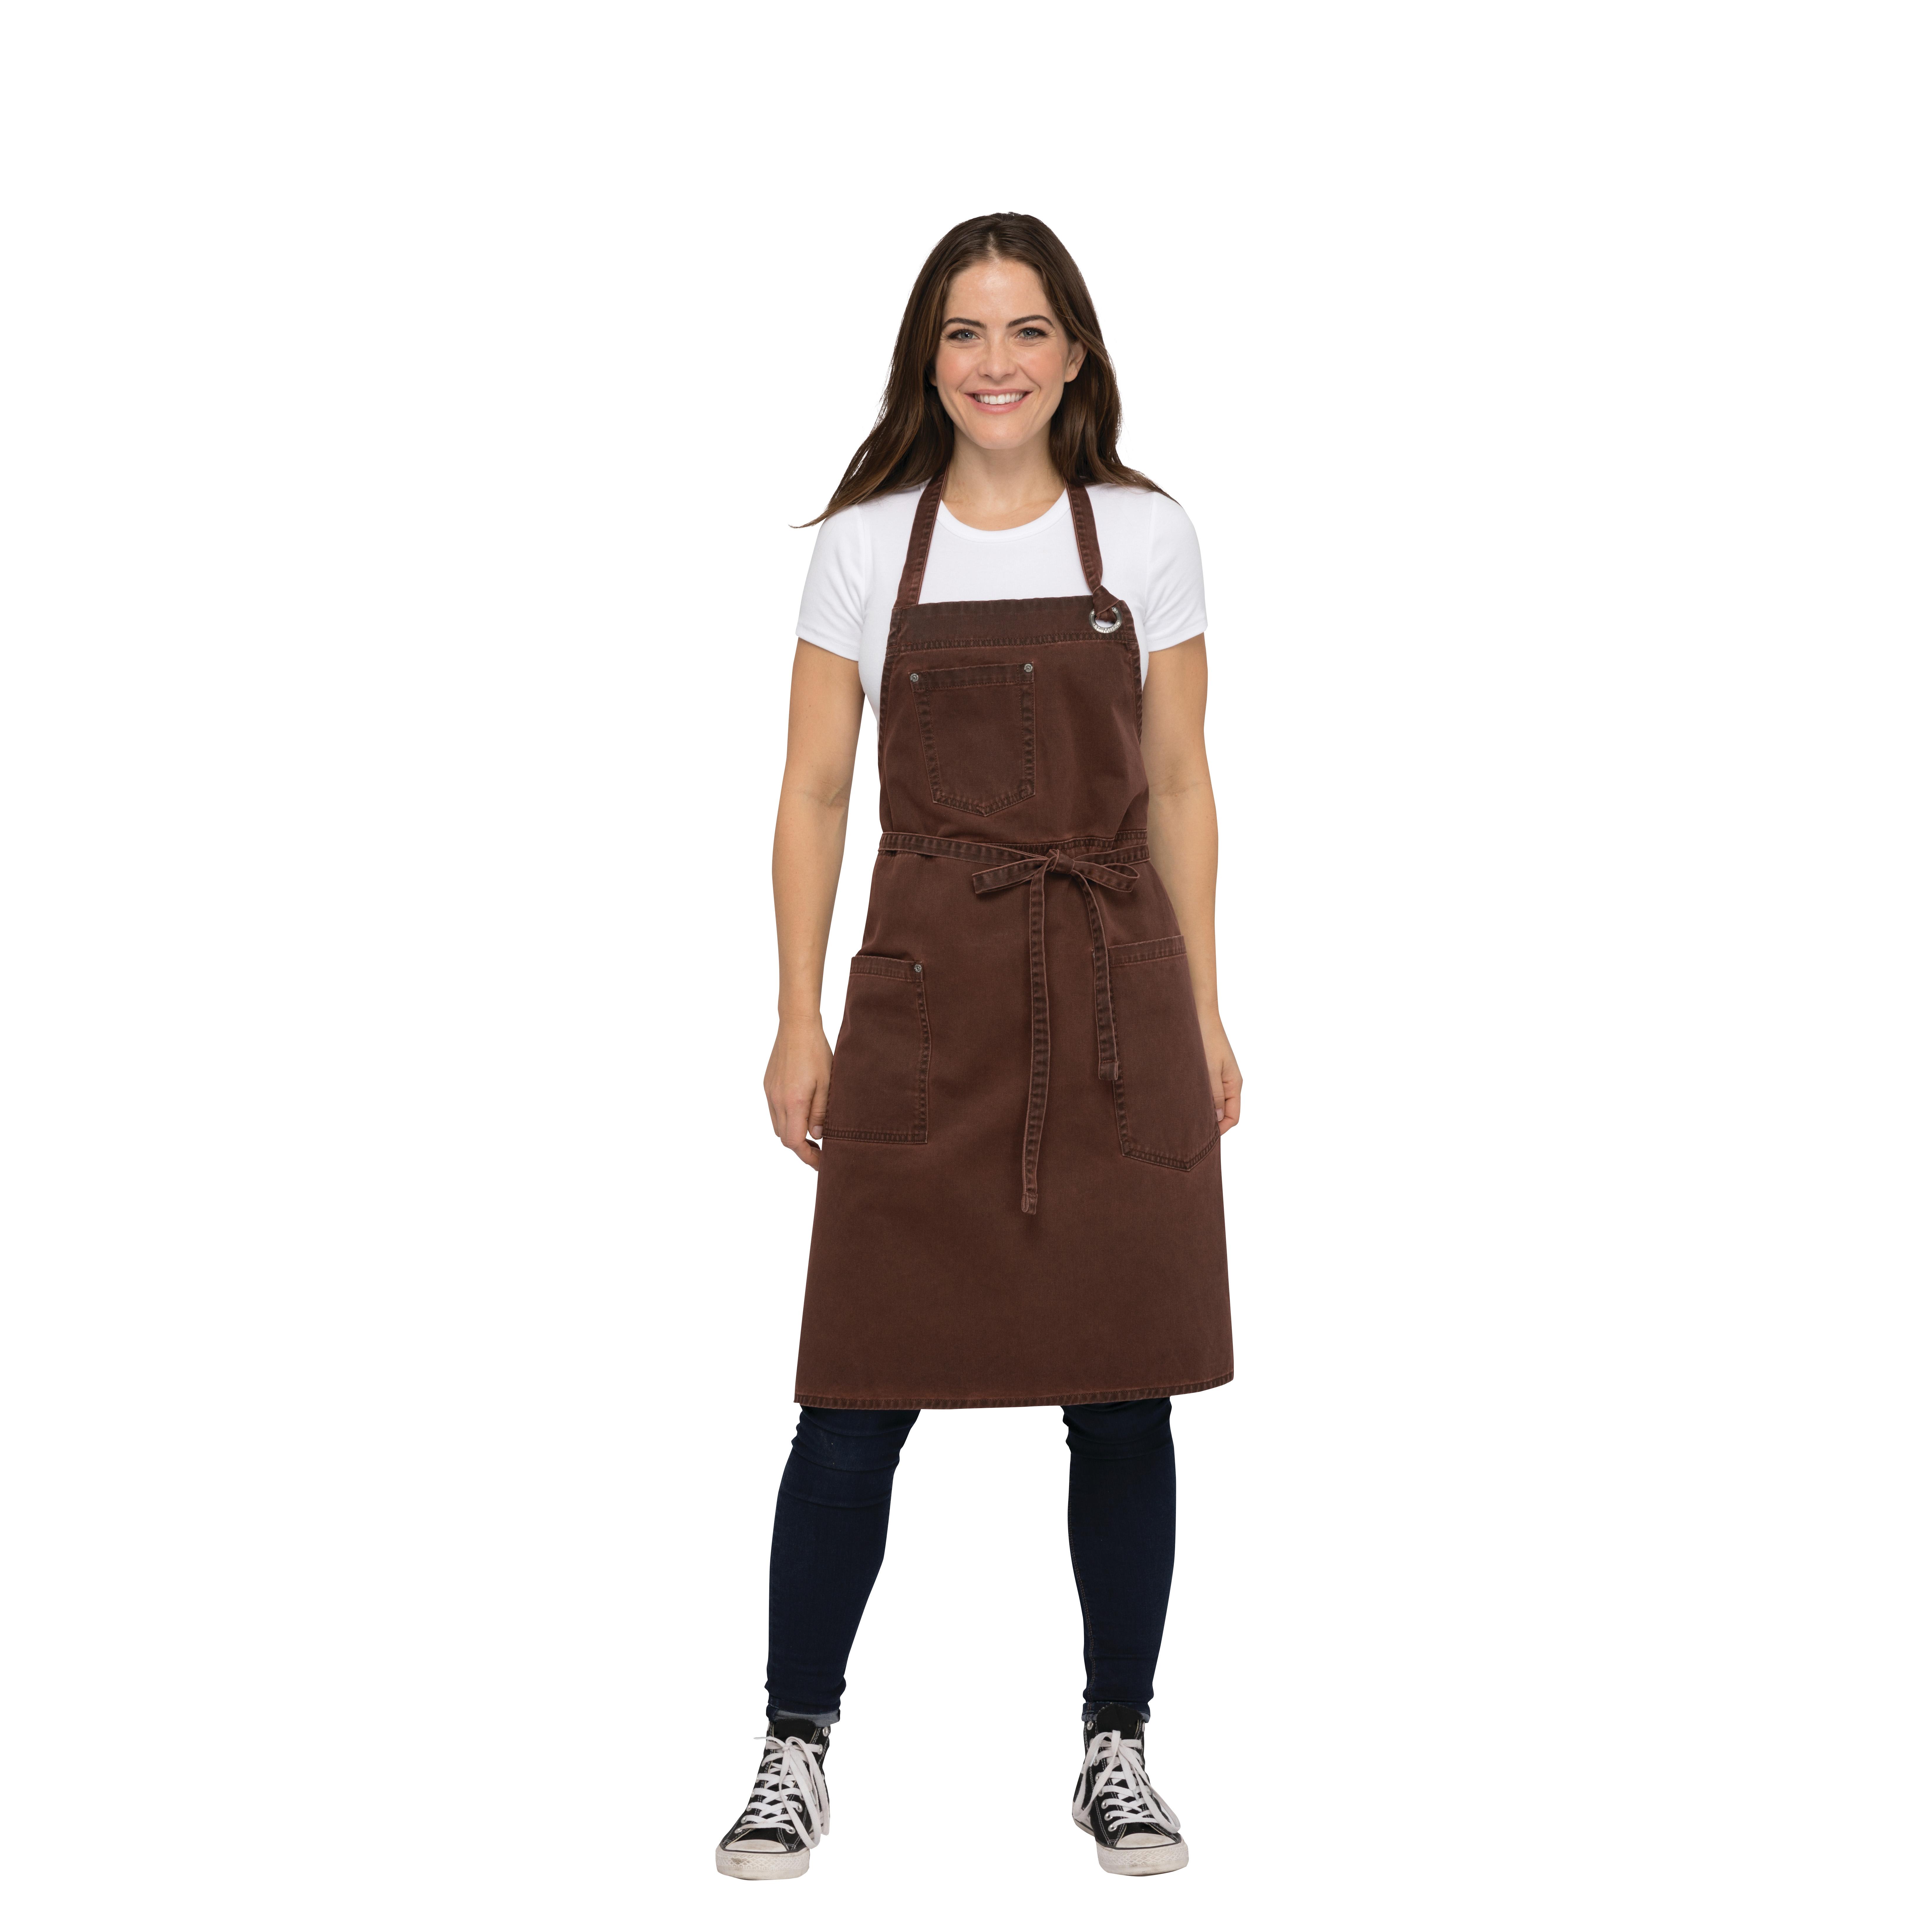 Chef Works ABAQ054RUS0 bib apron